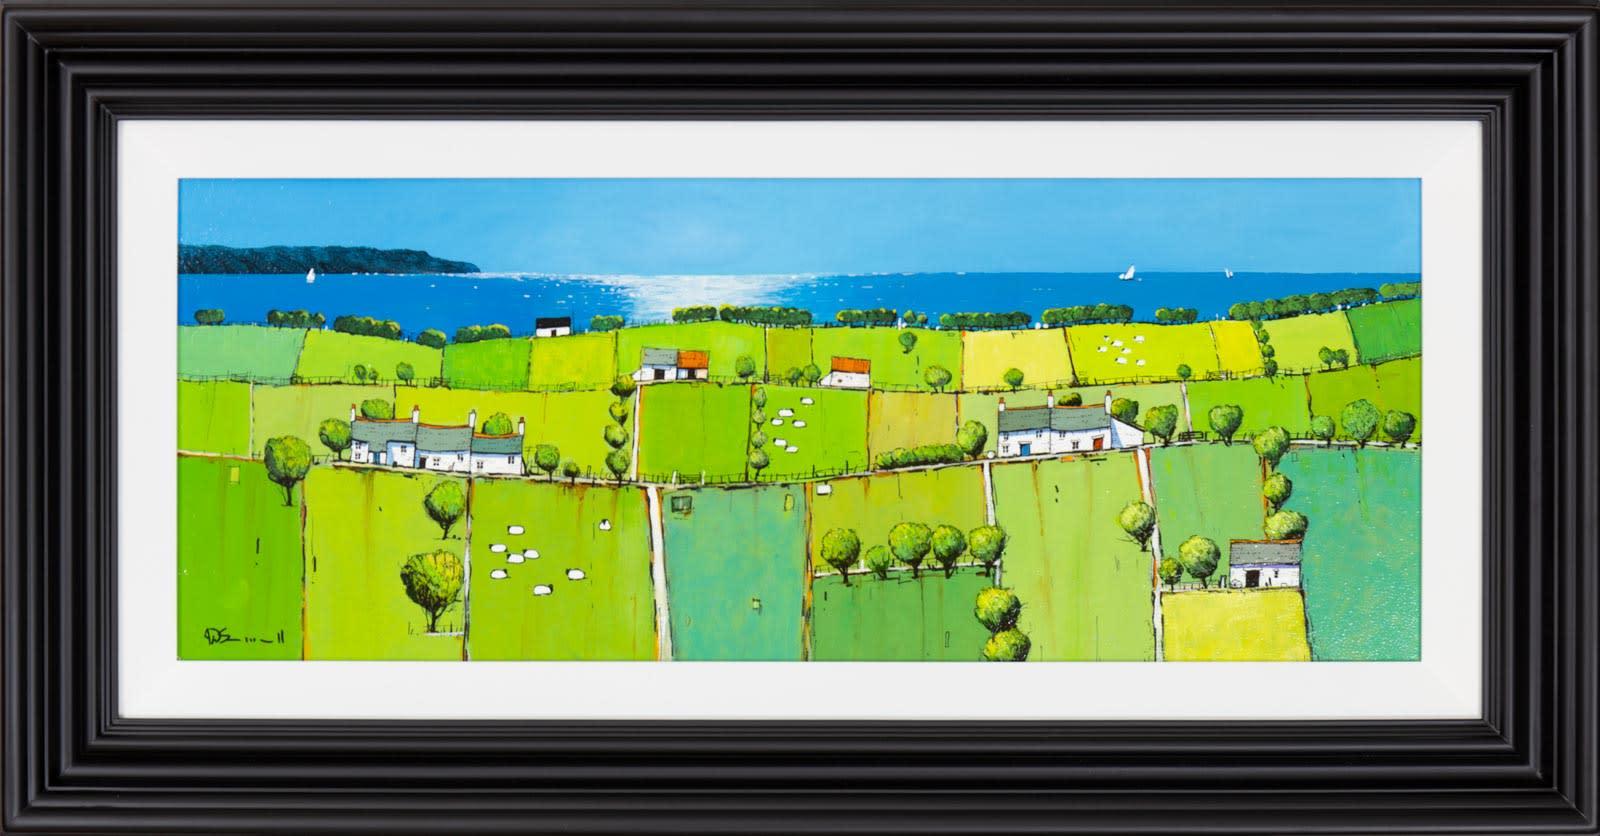 Cornwall Dreaming, Alan Smith